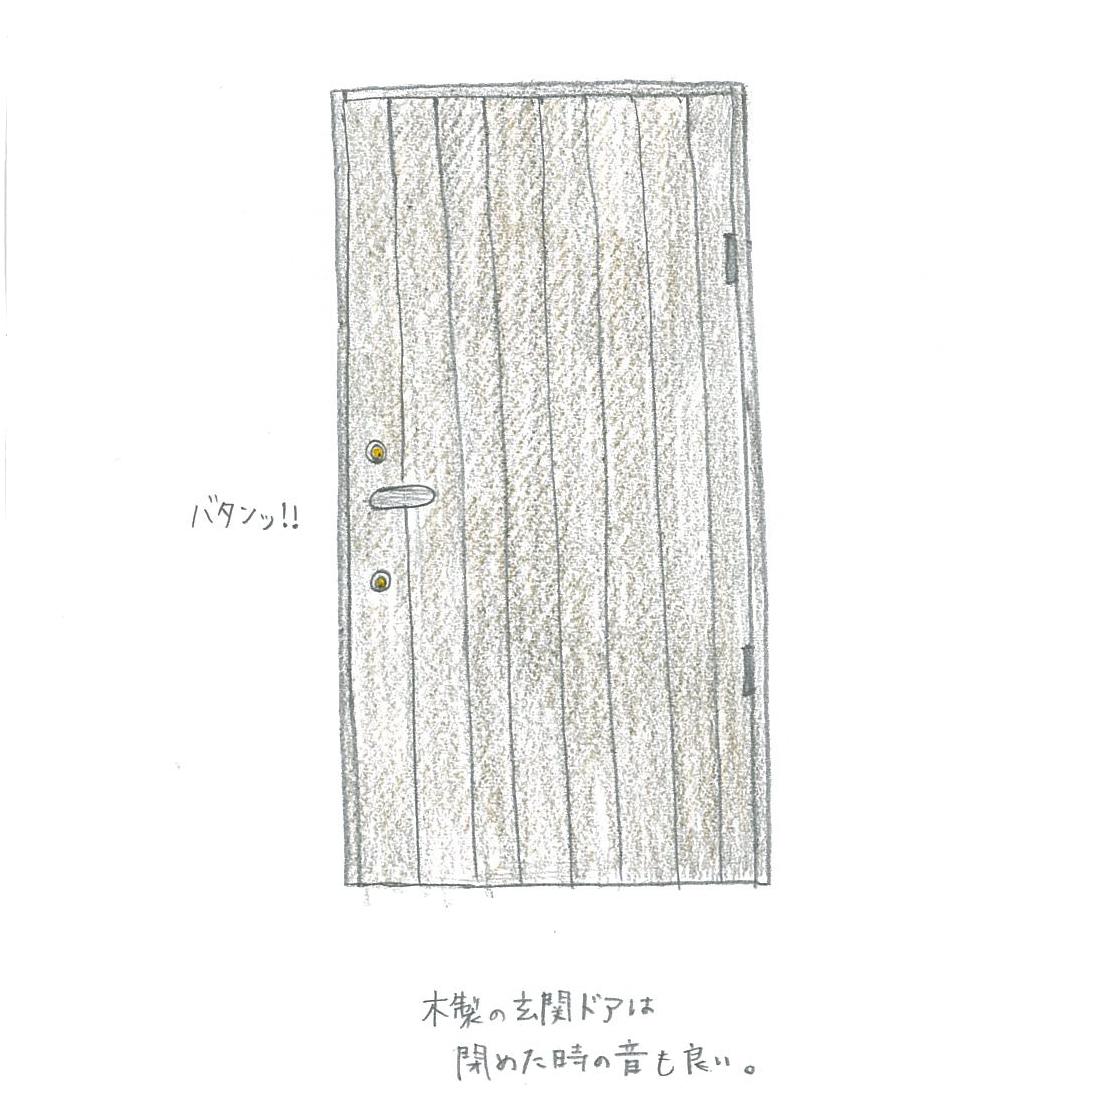 【TIME】家づくりストーリー第2話『木製玄関ドアへの憧れ』